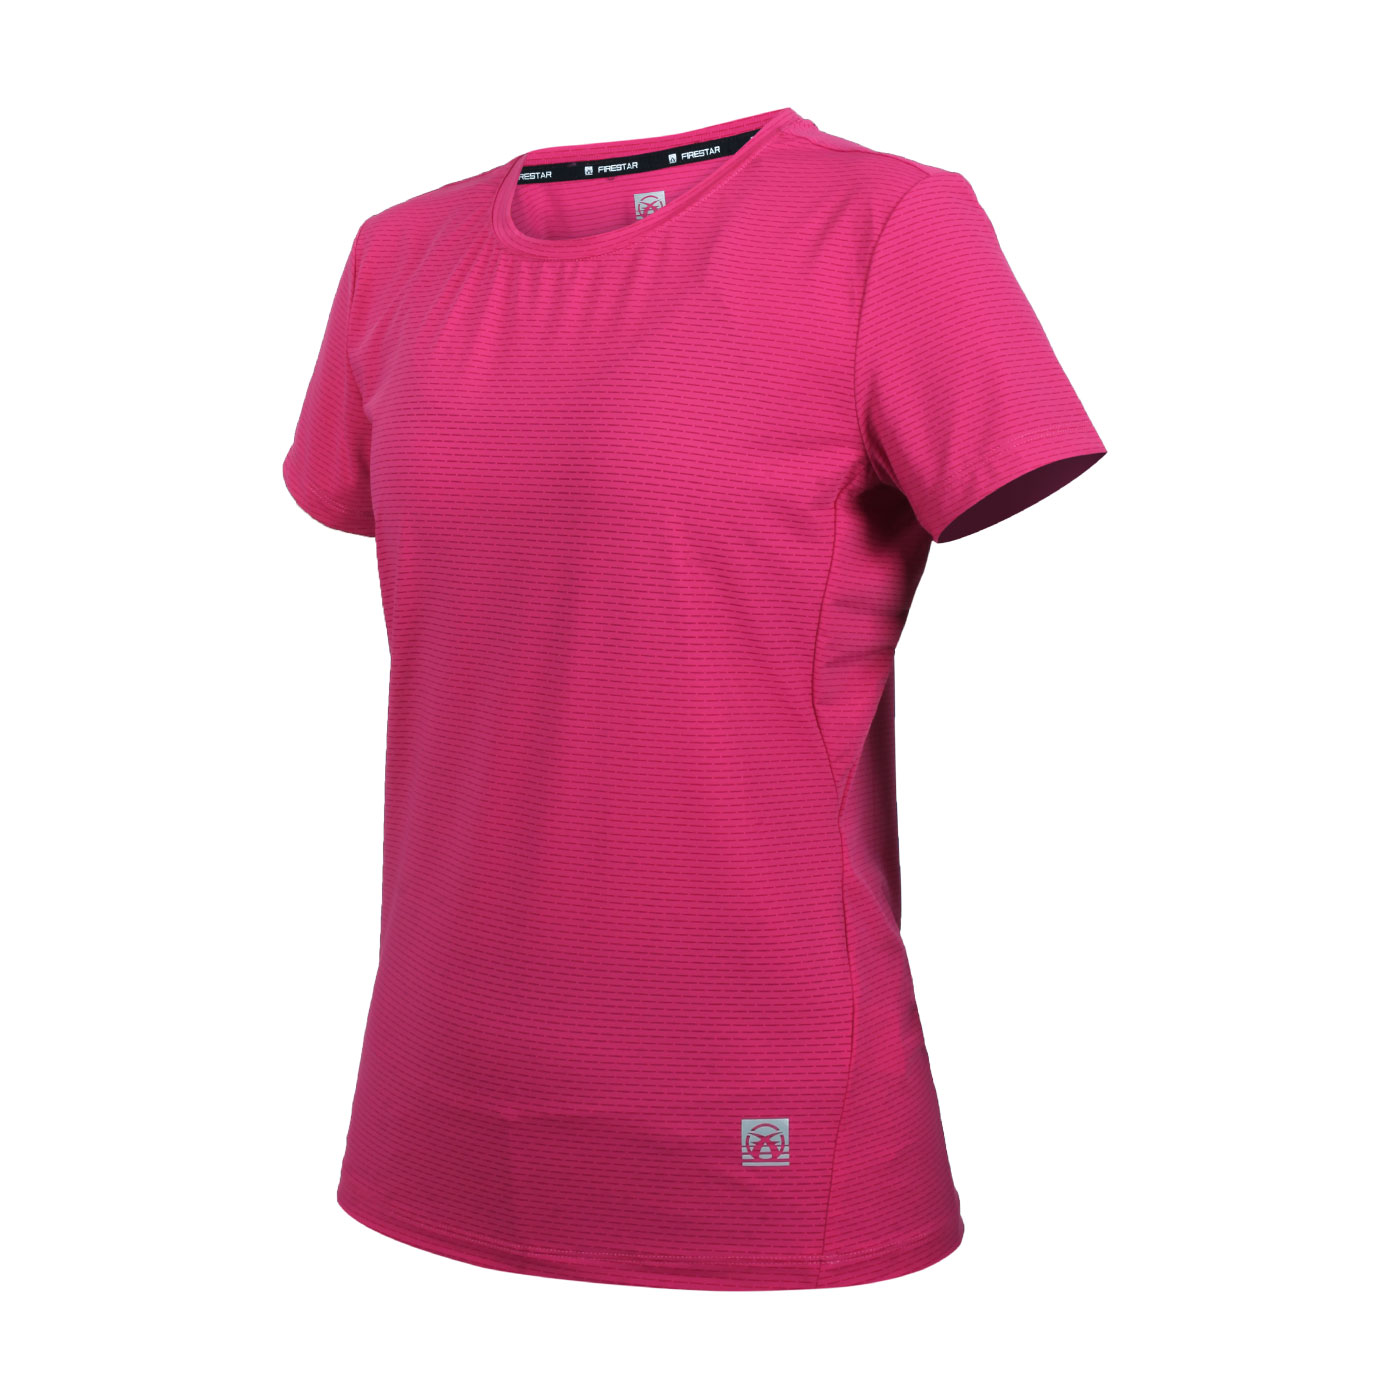 FIRESTAR 女款彈性機能圓領短袖T恤 DL161-47